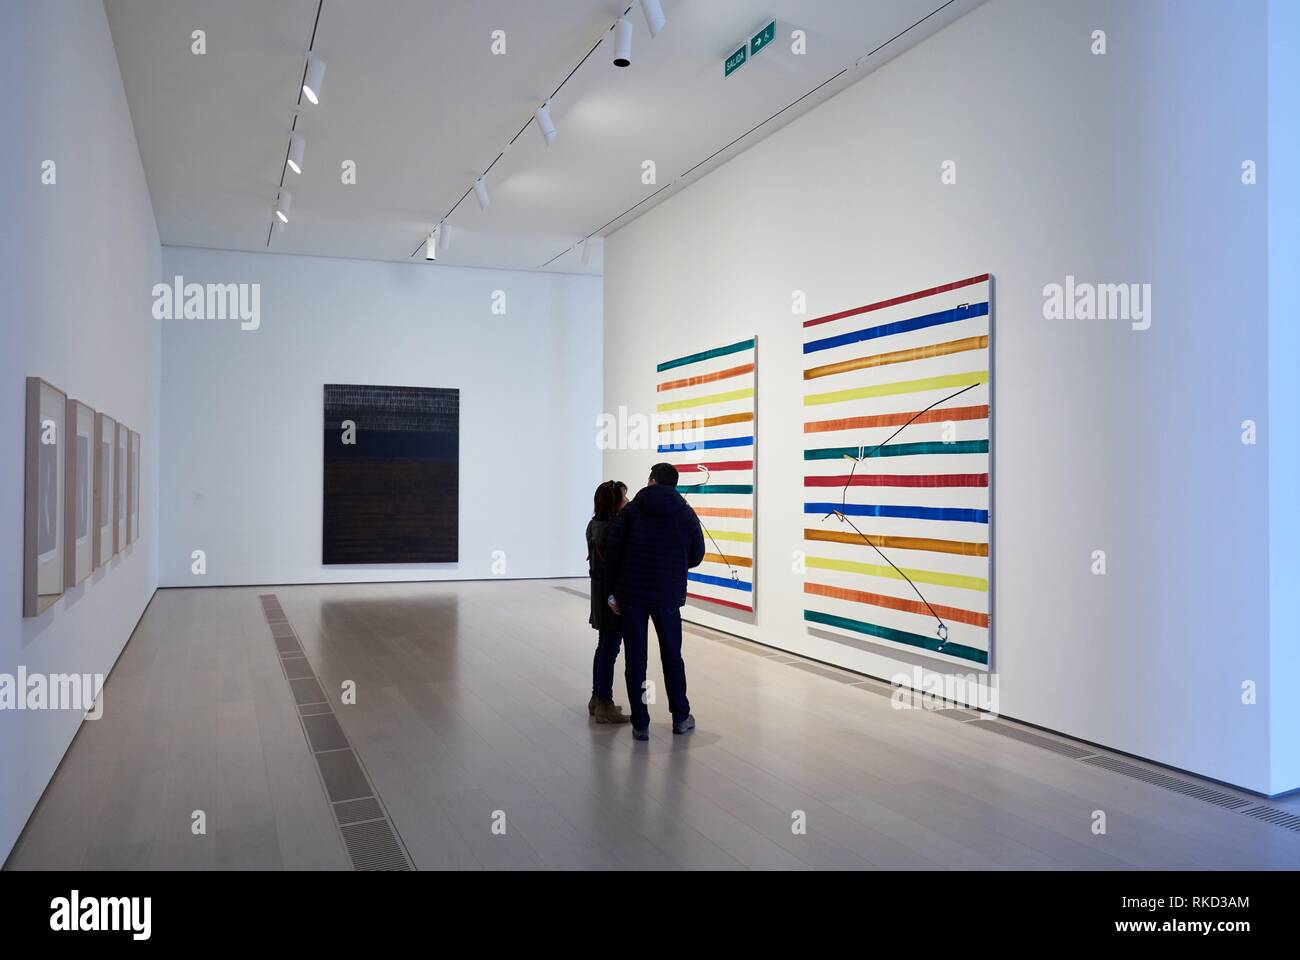 Botin Center Museum Art and Culture, Architect Renzo Piano, Santander, Cantabria, Spain, Europe - Stock Image